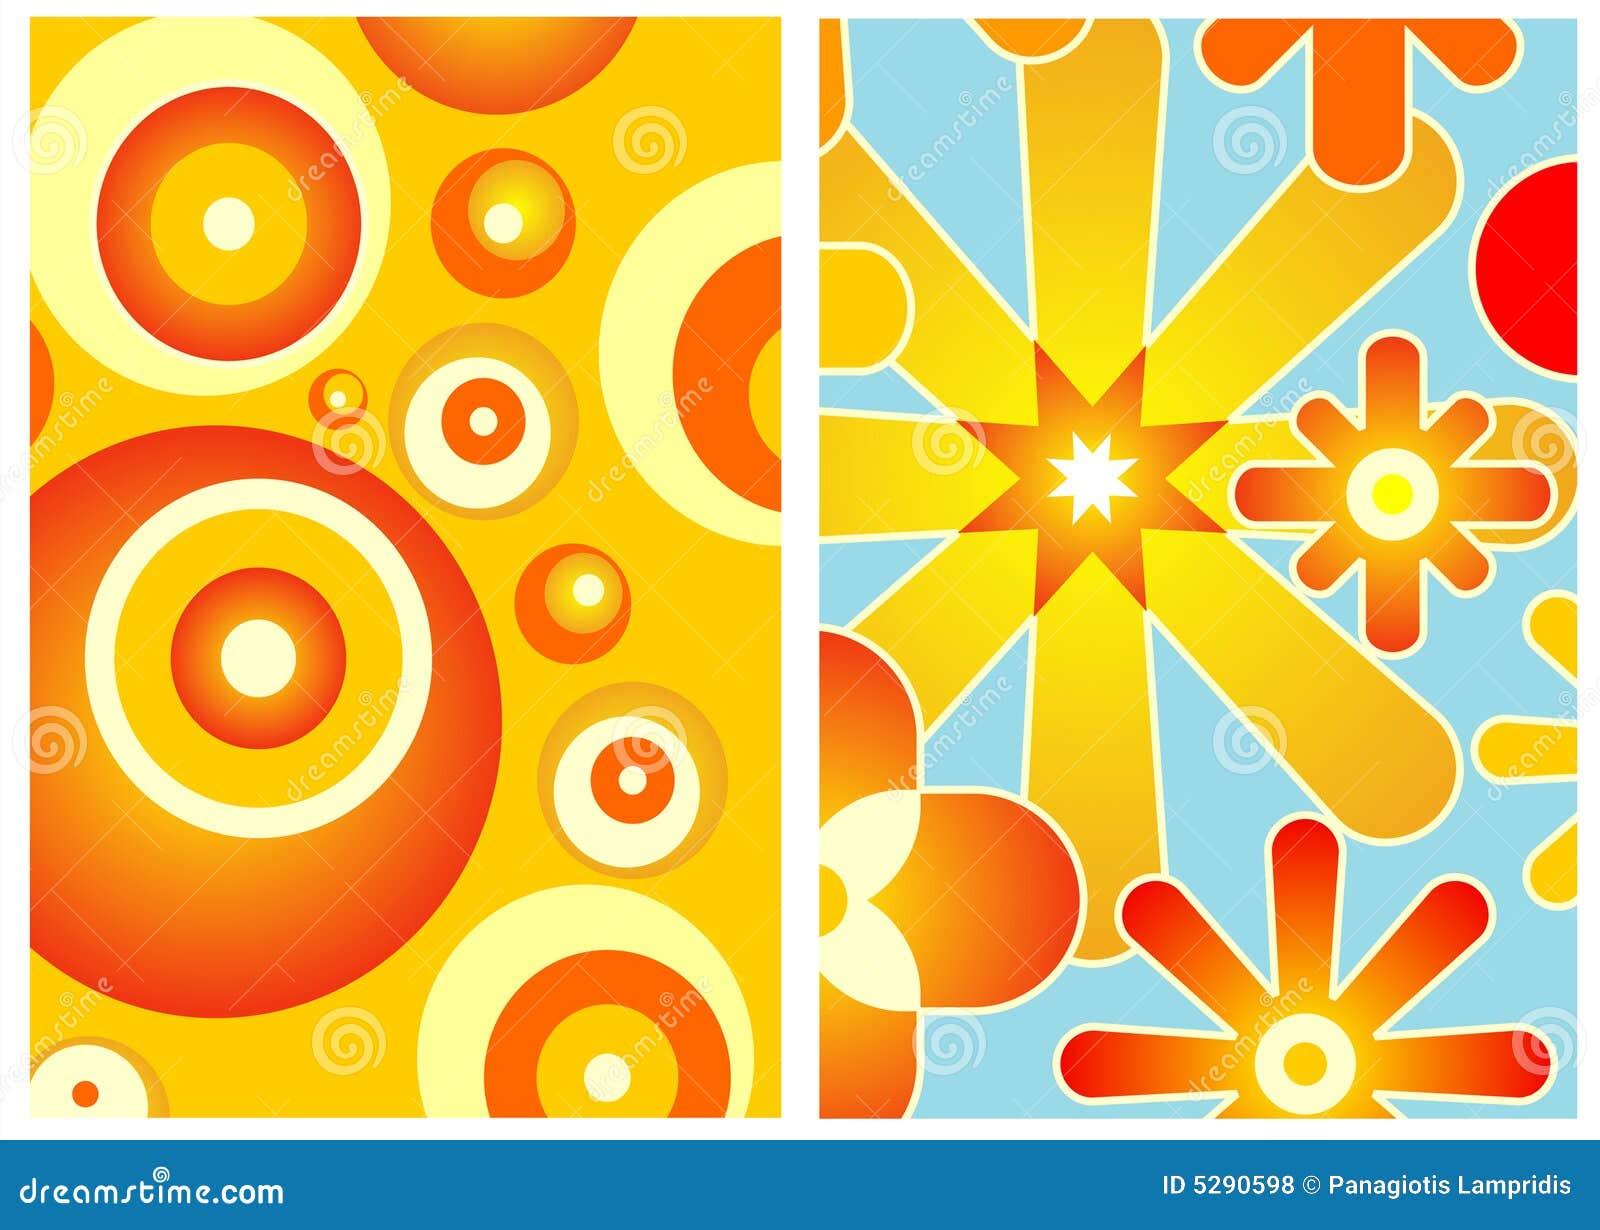 70s decor stock vector. Illustration of orange, decor - 5290598